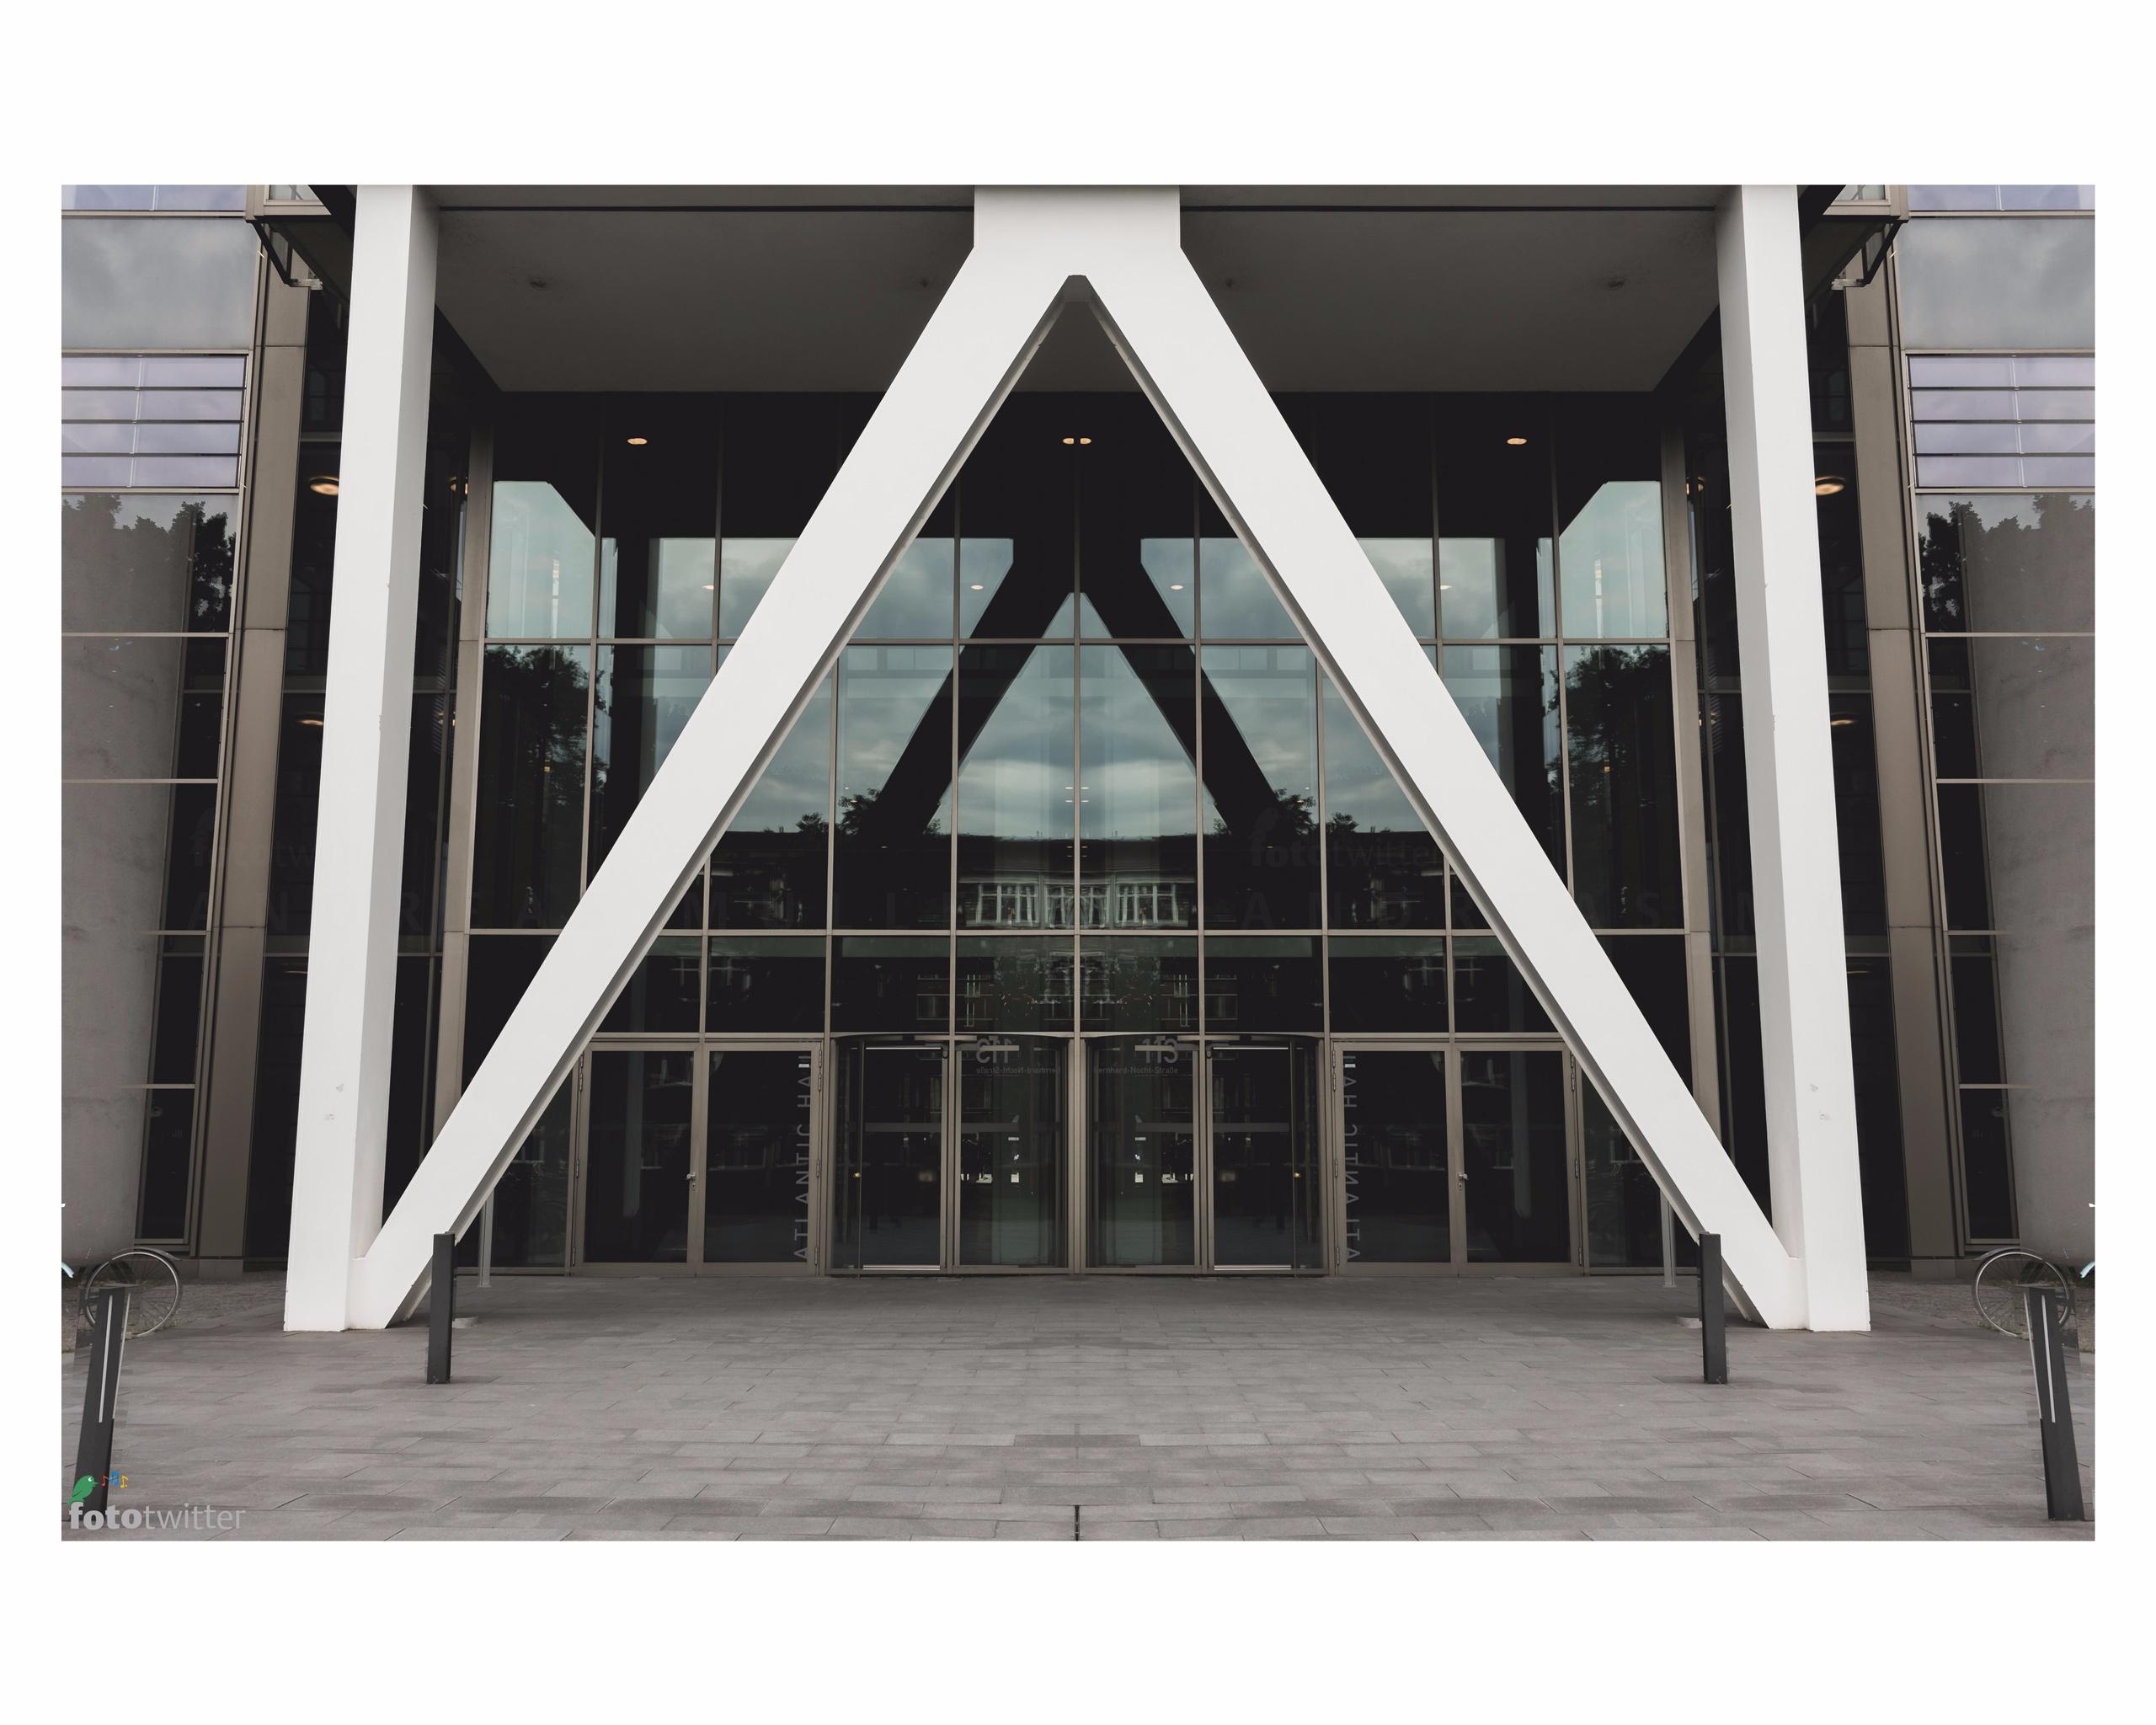 Atlantikhaus Reeperbahn - architecture - fototwitter | ello